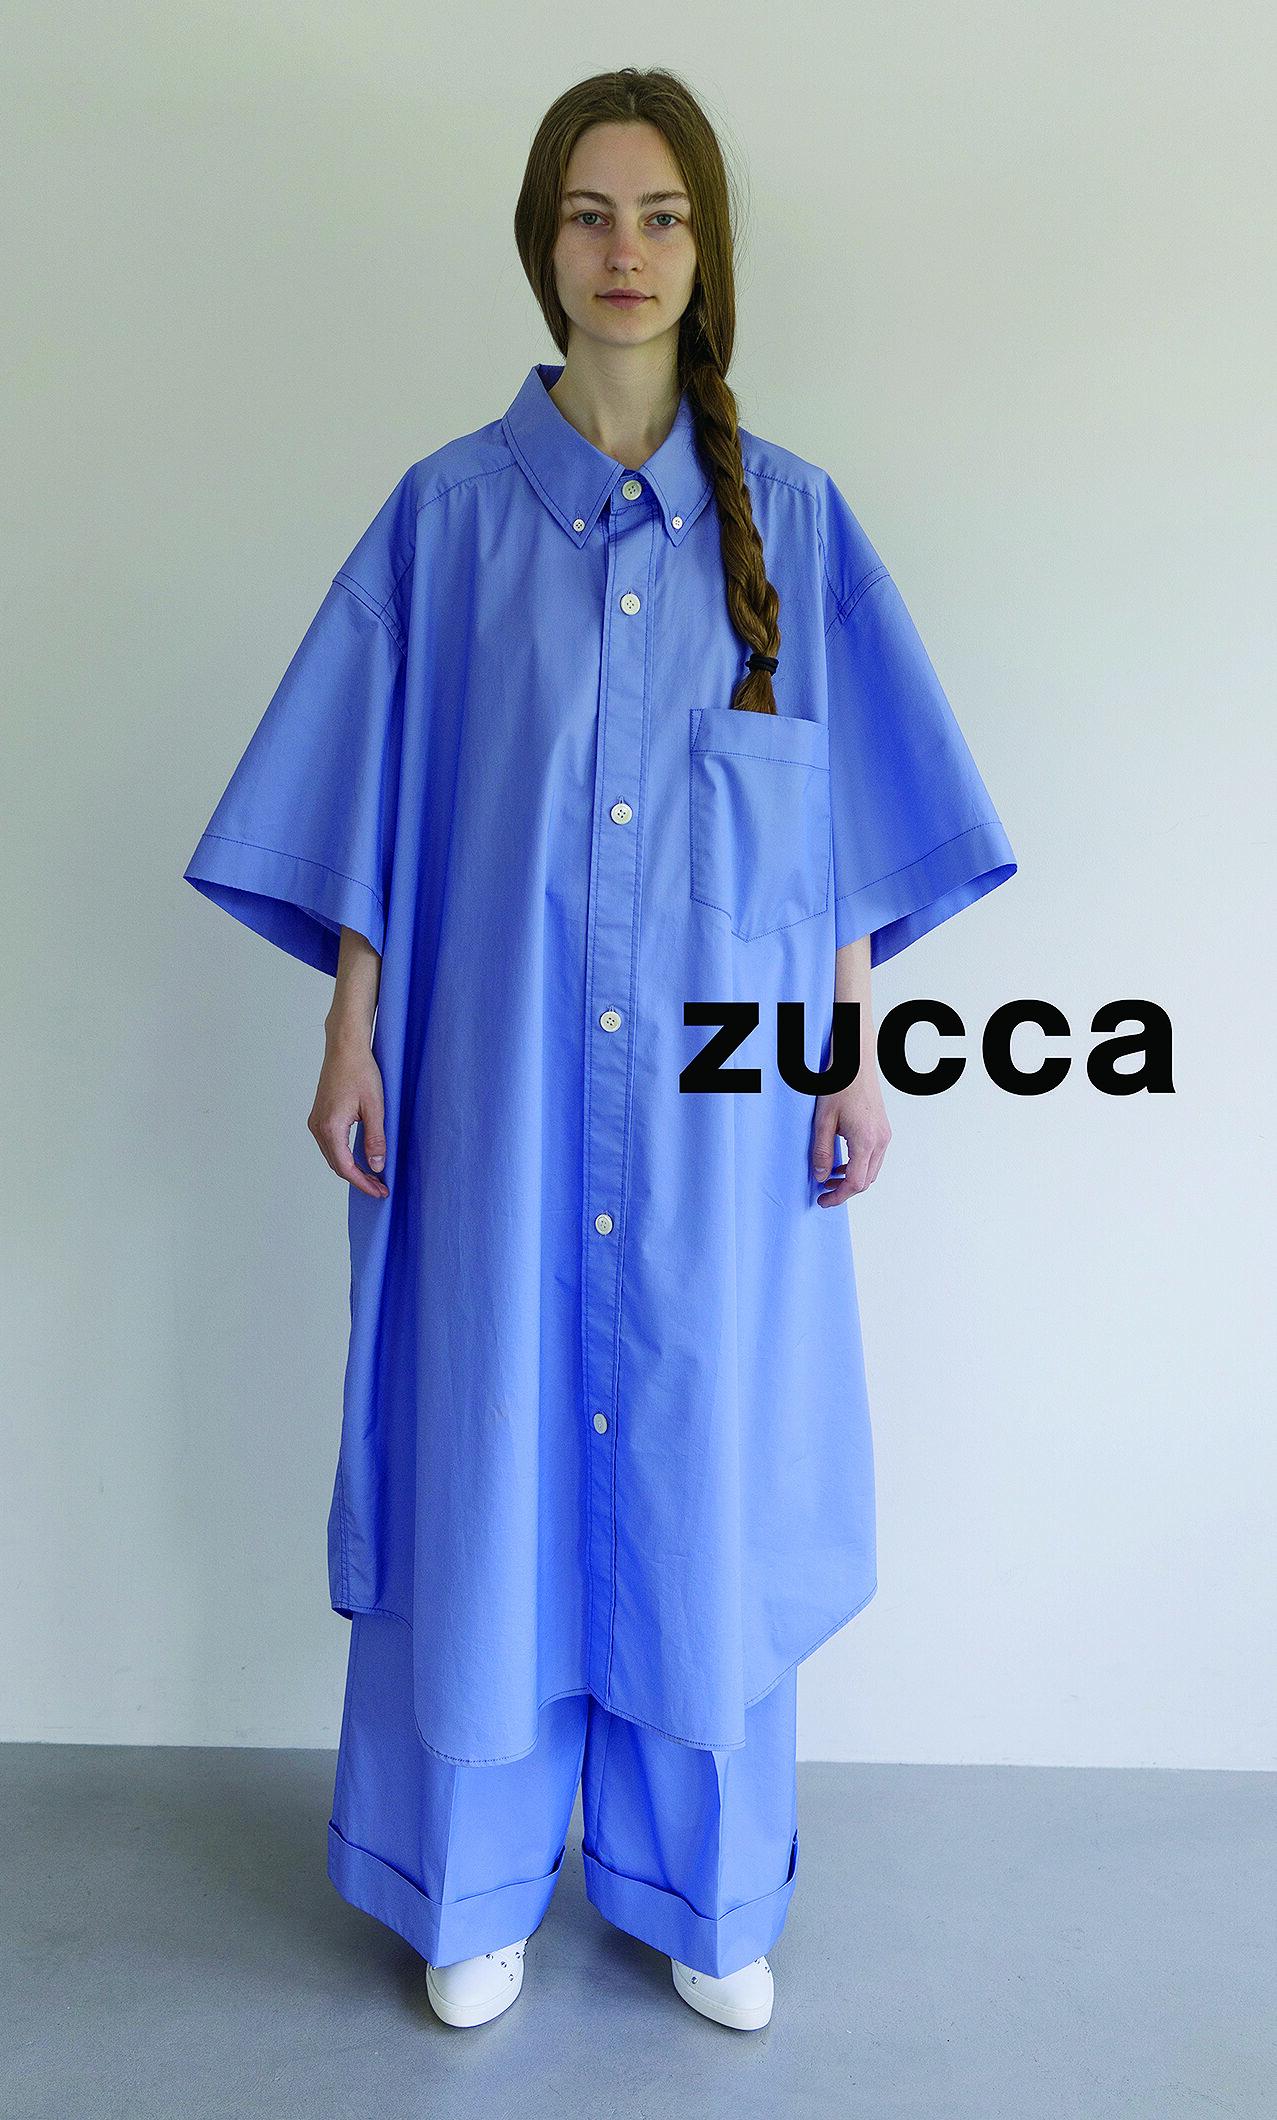 『ZUCCa 香林坊大和』が2階にリニューアルOPEN。